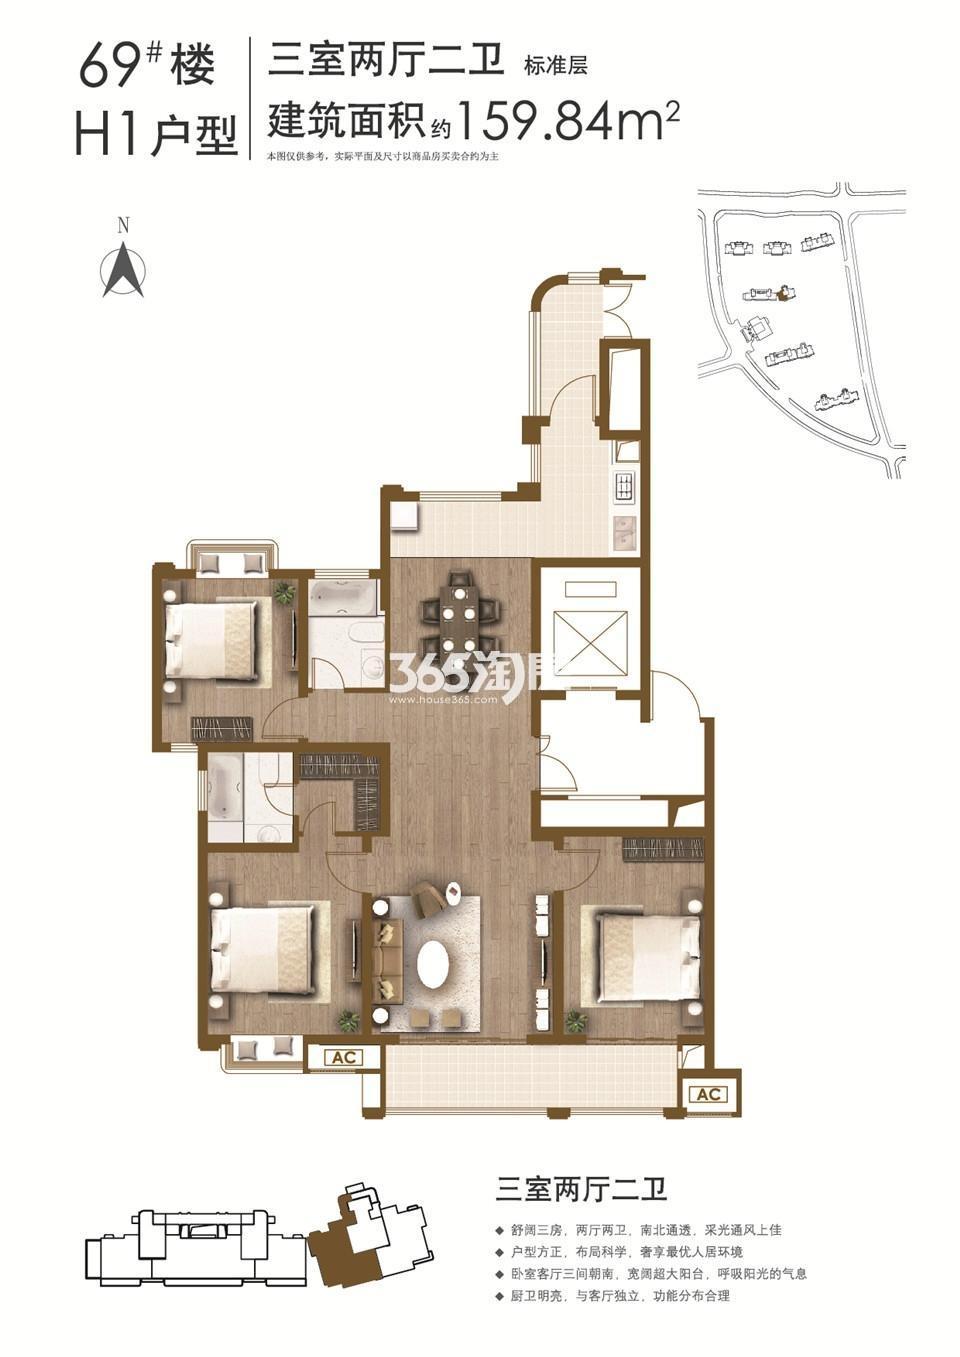 H1户型3室2厅2卫1厨 159.84㎡